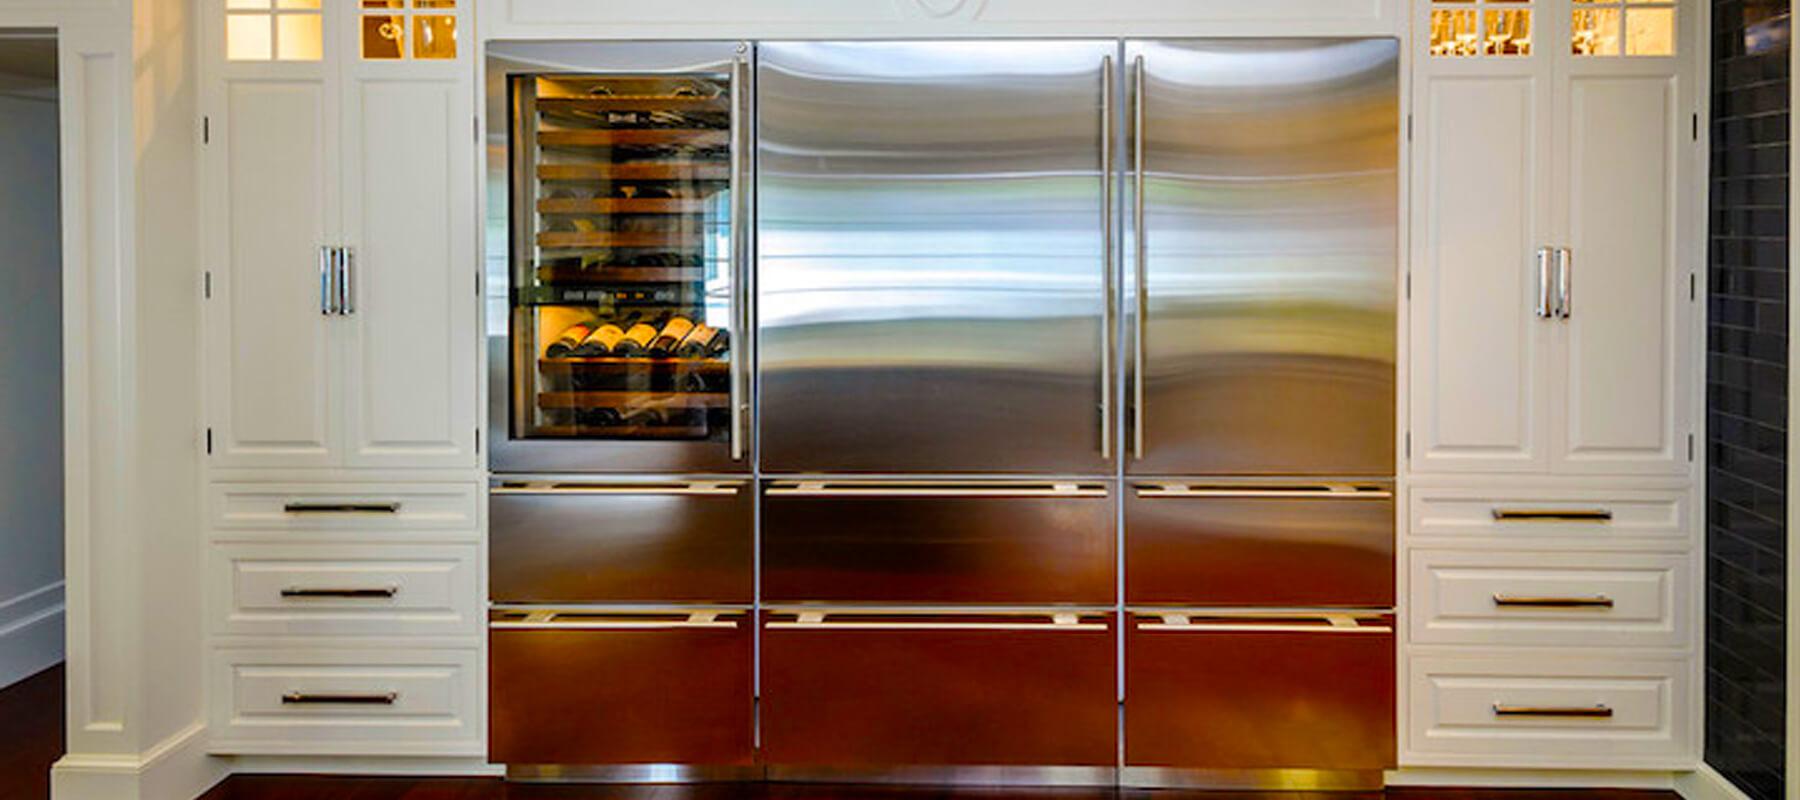 Built in Wine Refrigerator Undercounter Beverly Hills | Built-in Refrigerator Repair